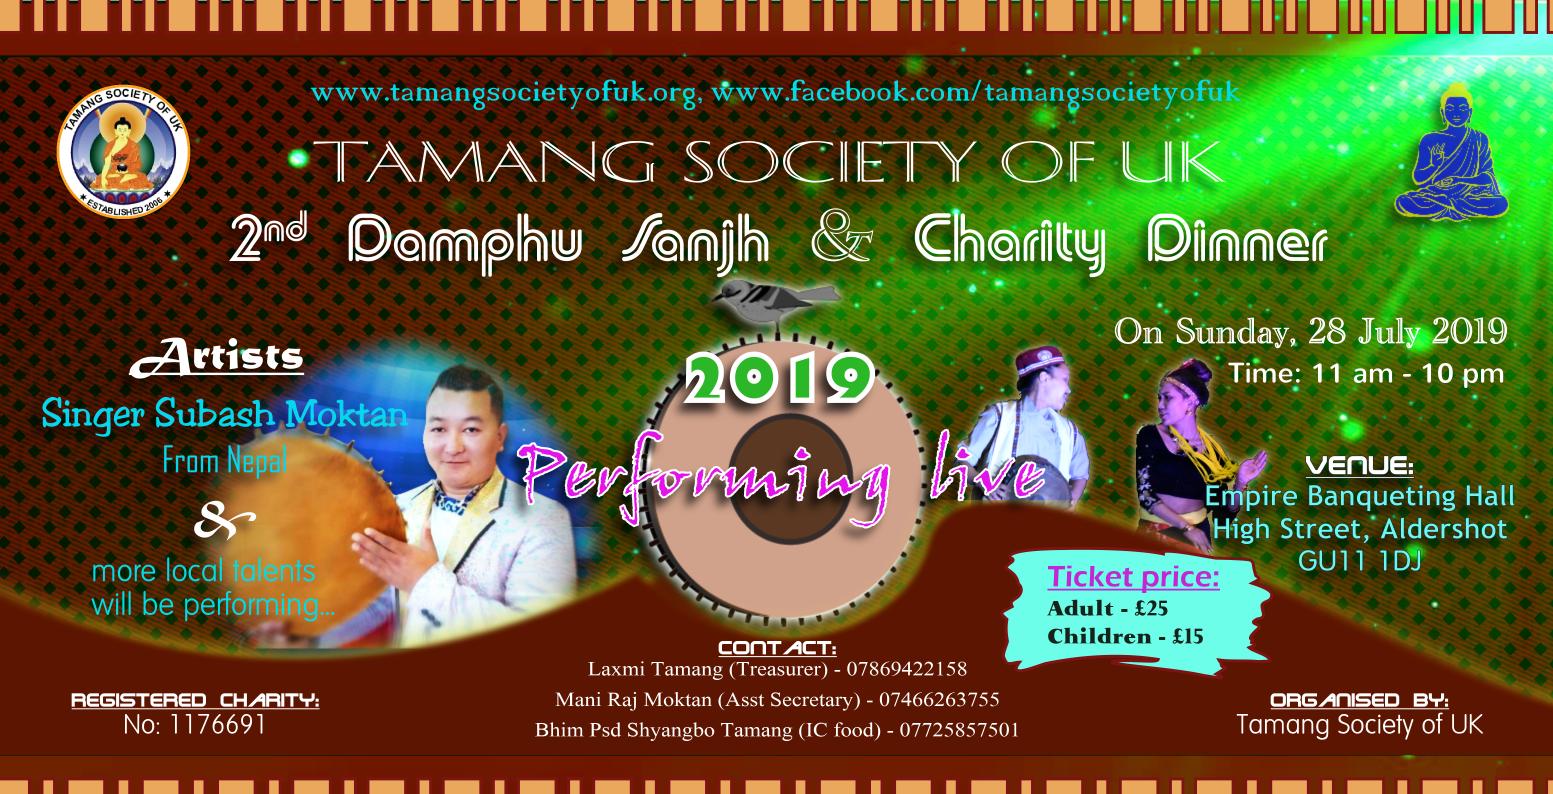 damphoo sanjh 2019-1